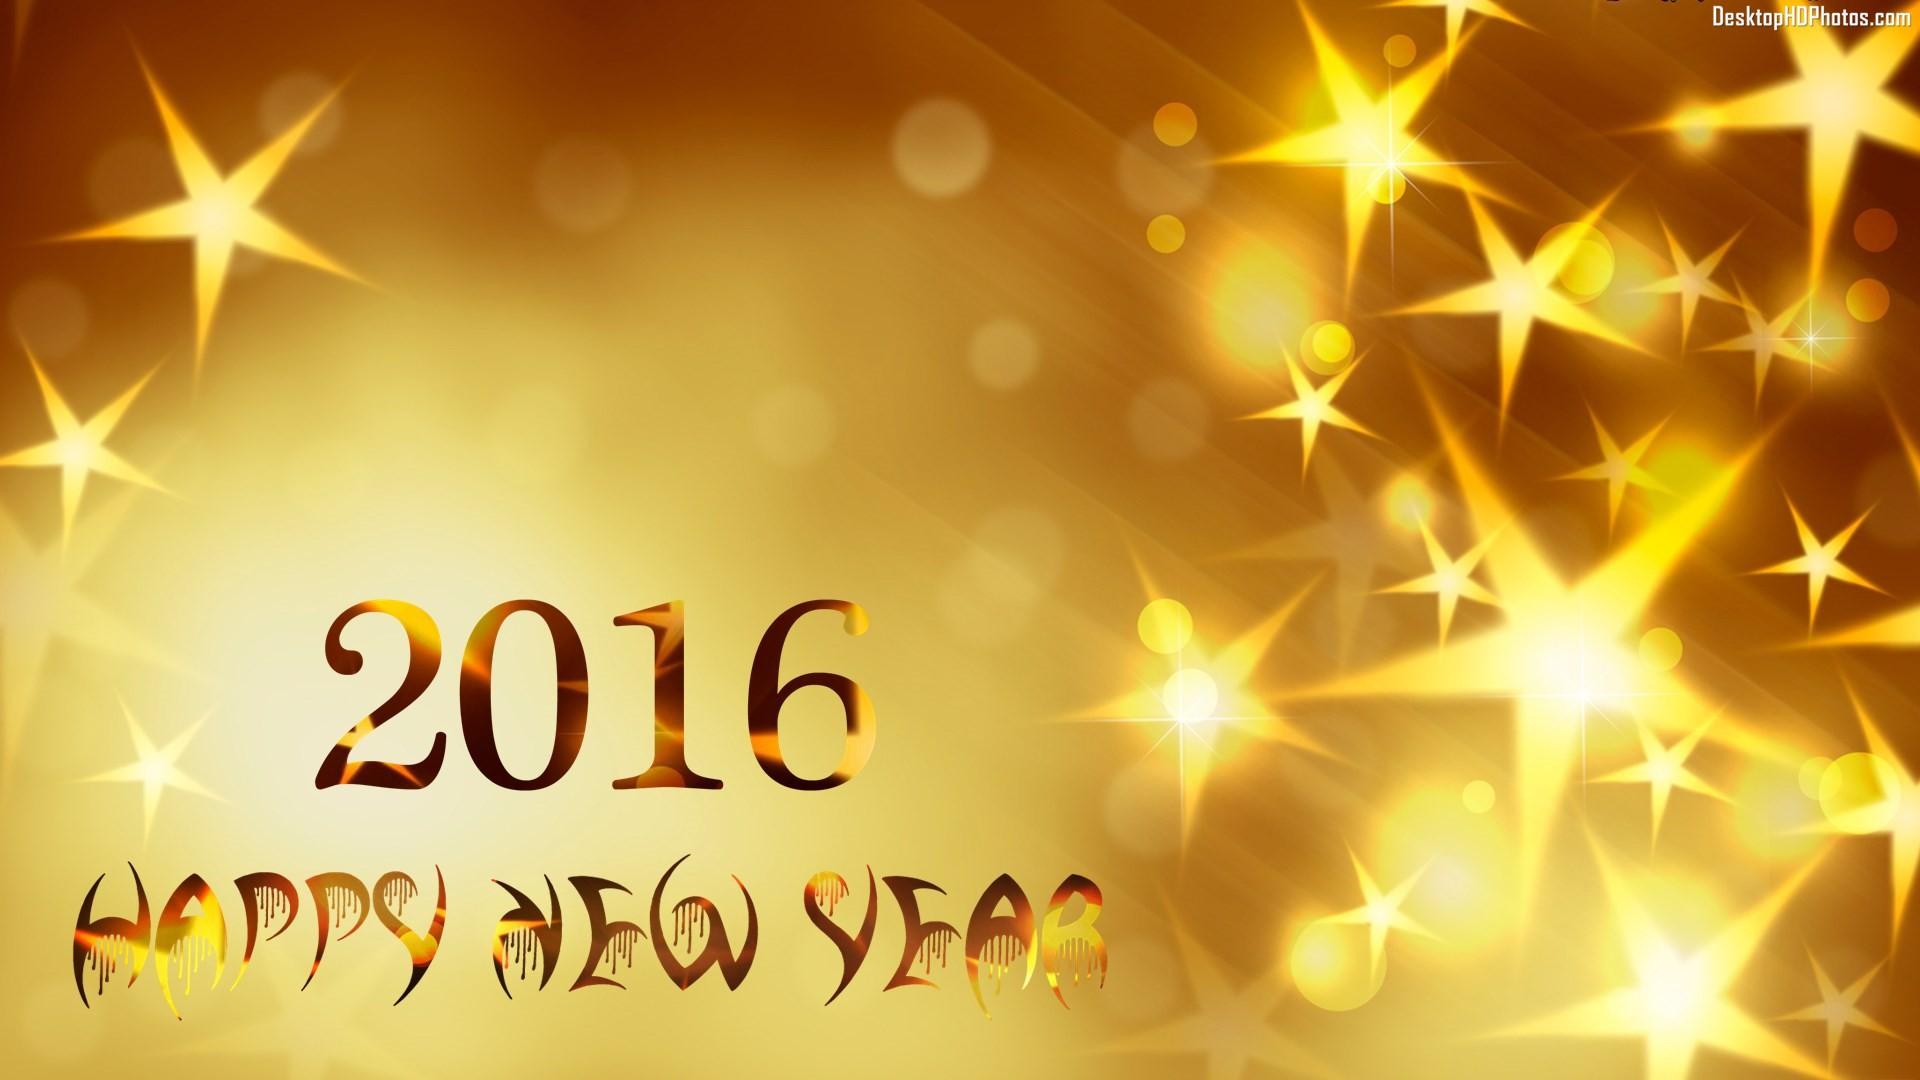 Top 30 Best HD Happy New Year 2016 Wallpapers for Desktop 1920x1080